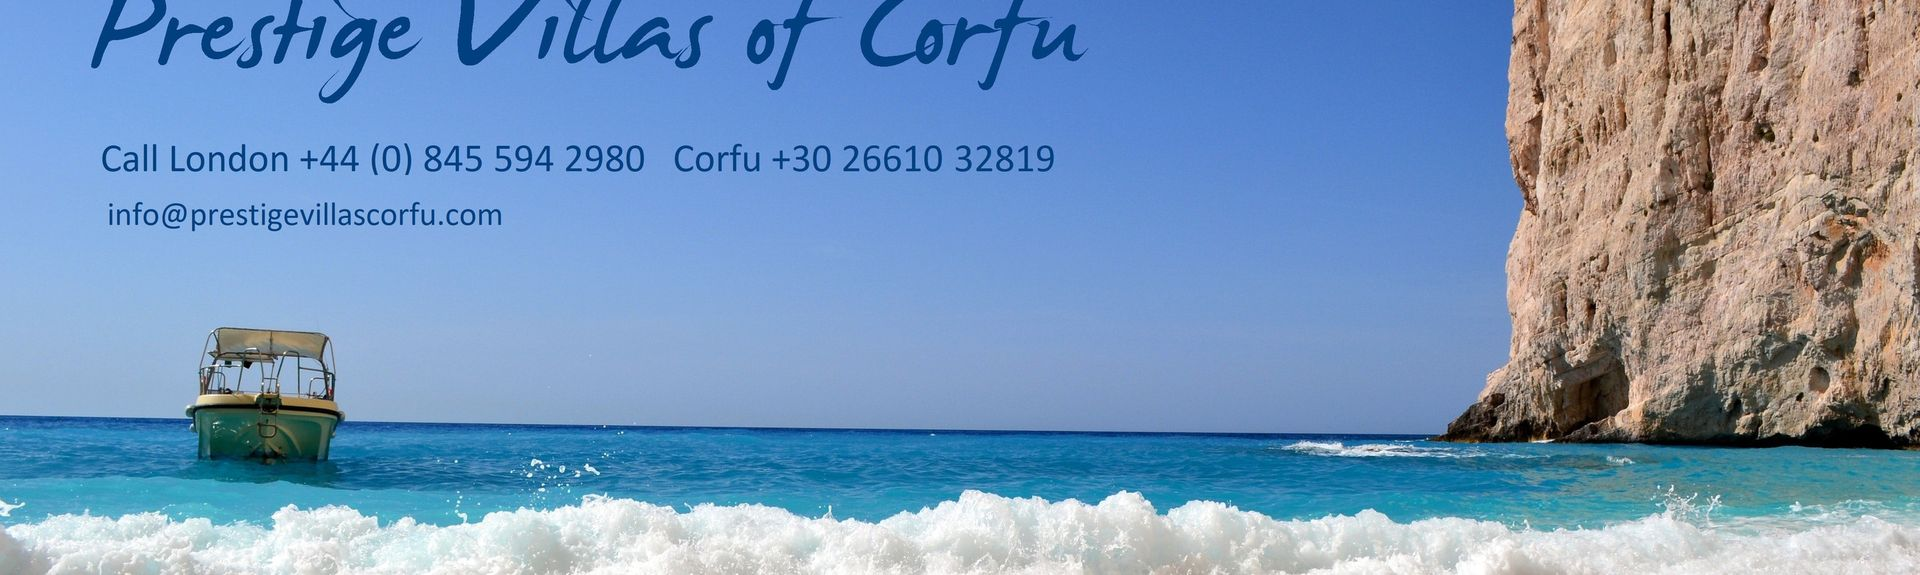 Moraitika, Corfu, Ionian Islands Region, Greece